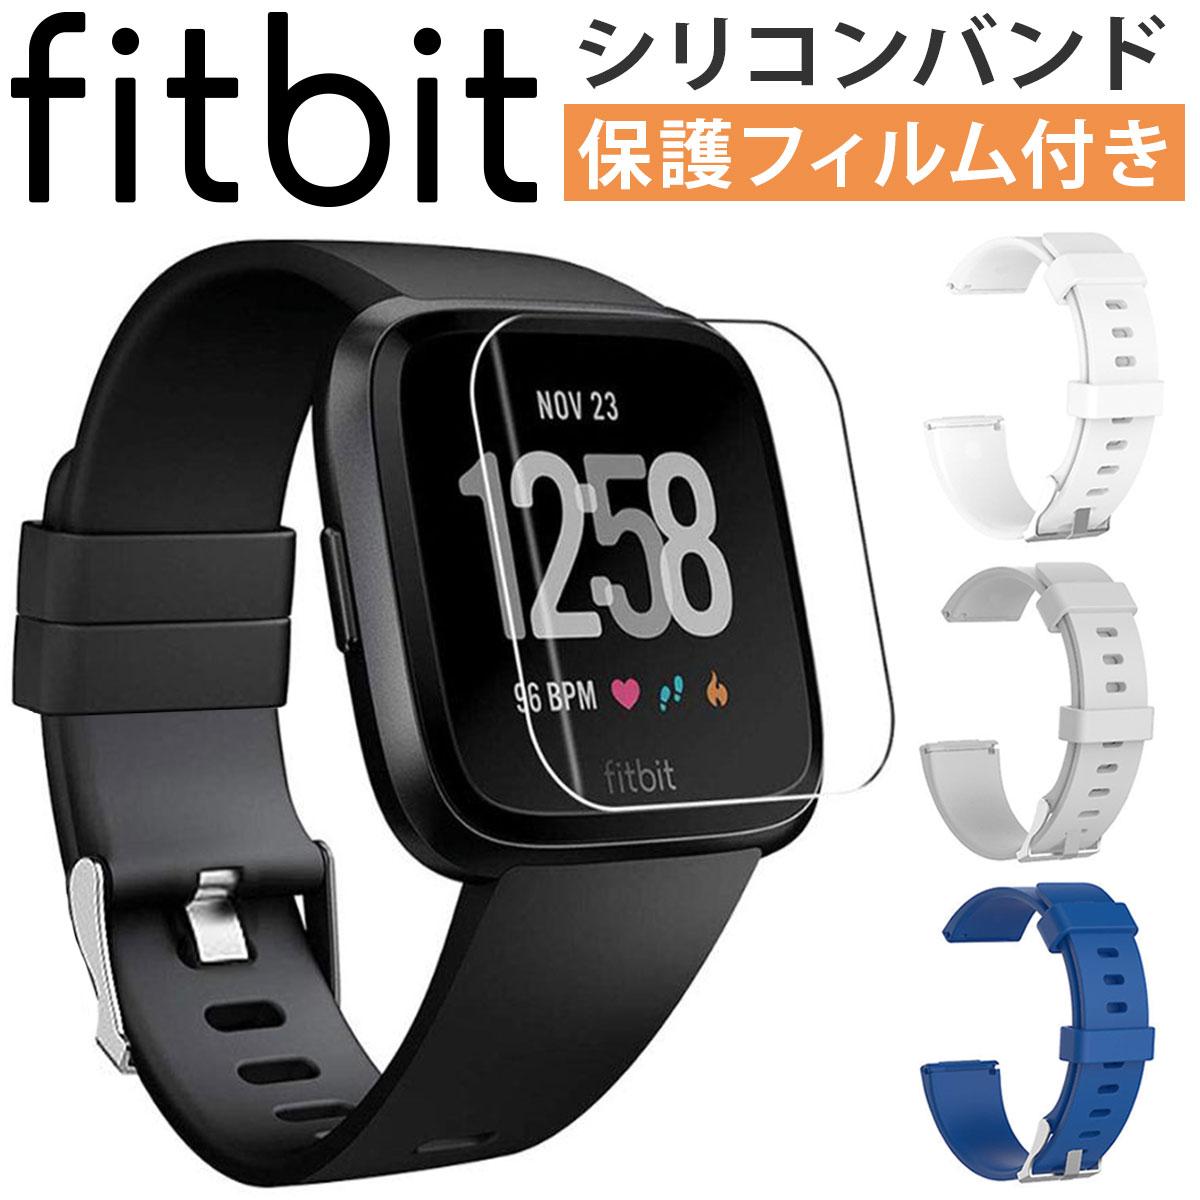 fitbit versa versa2 lite 交換 バンド フィットビット ヴァーサ ベルト Versa2 対応 保護フィルムセット ストアー Versa 期間限定お試し価格 Lite Fitbit カバー シリコン 保護フィルム